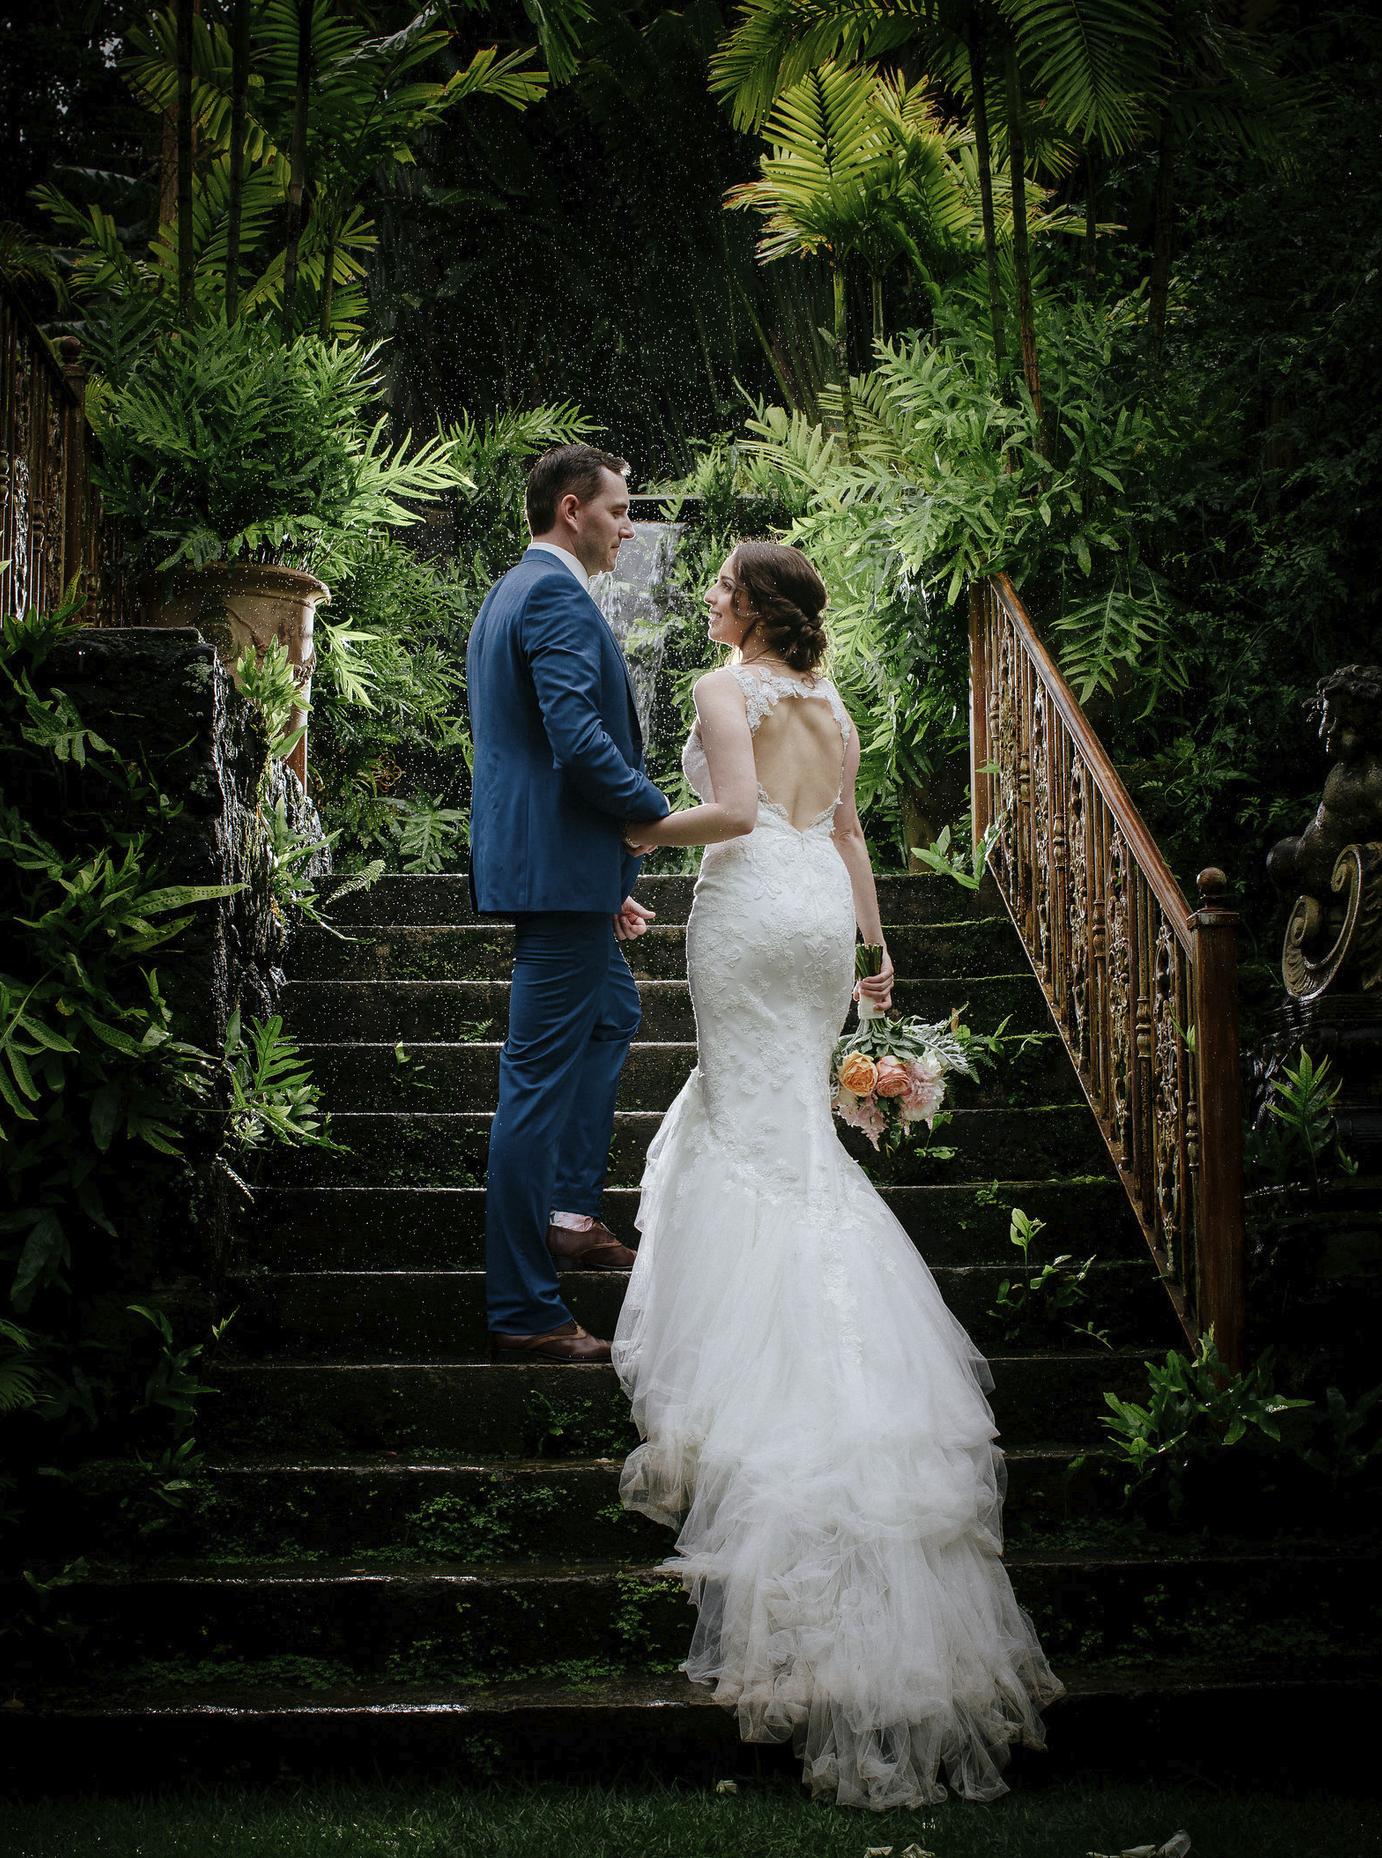 chris-j-evans-rain-wedding00010.png